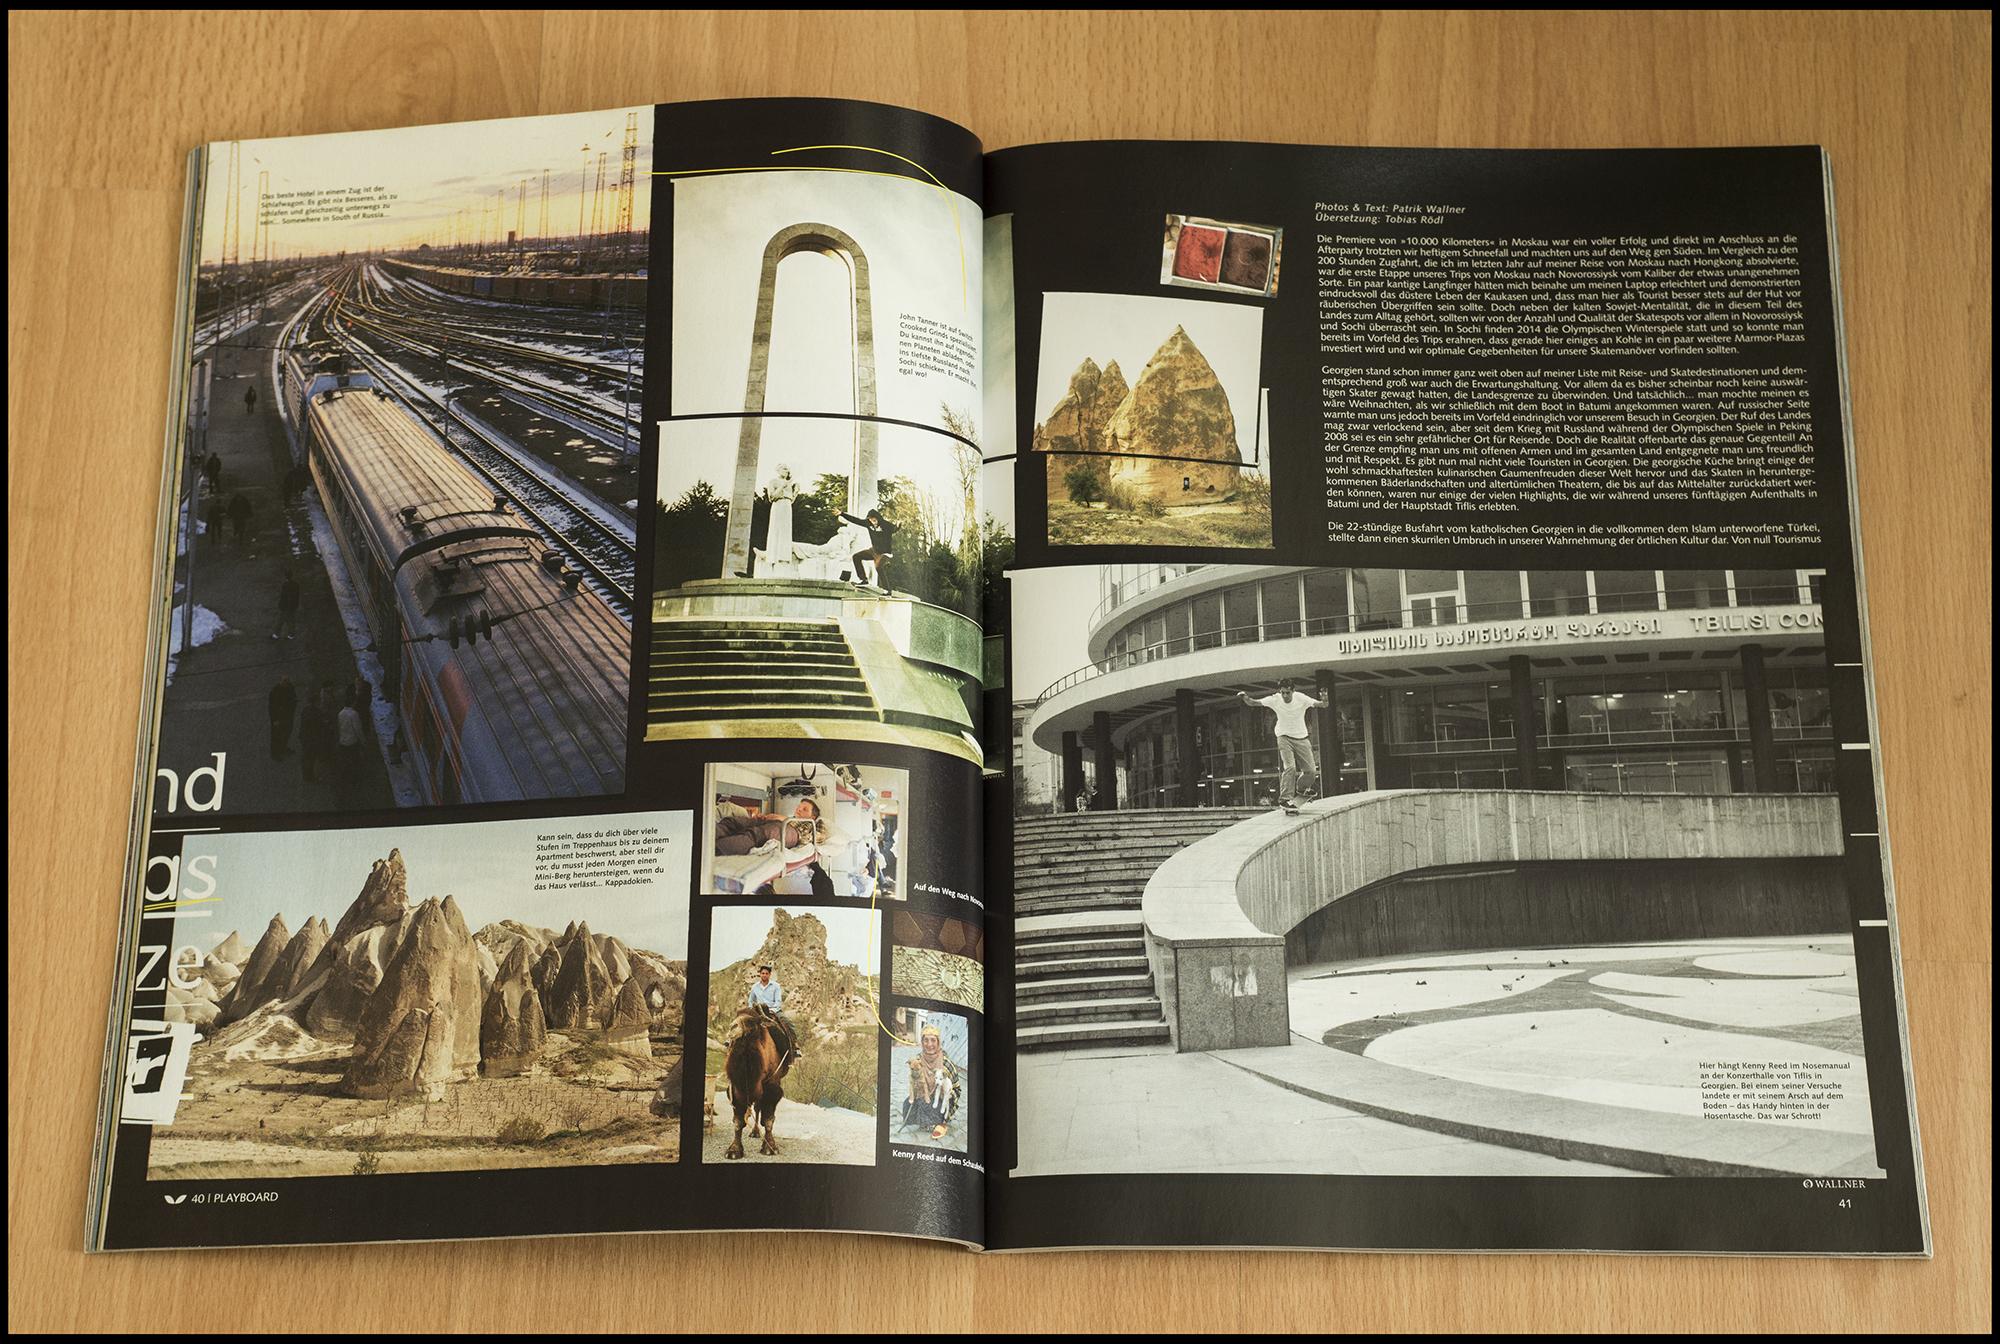 Magazines Playboard 62 Page 02 LOWQ 2000P